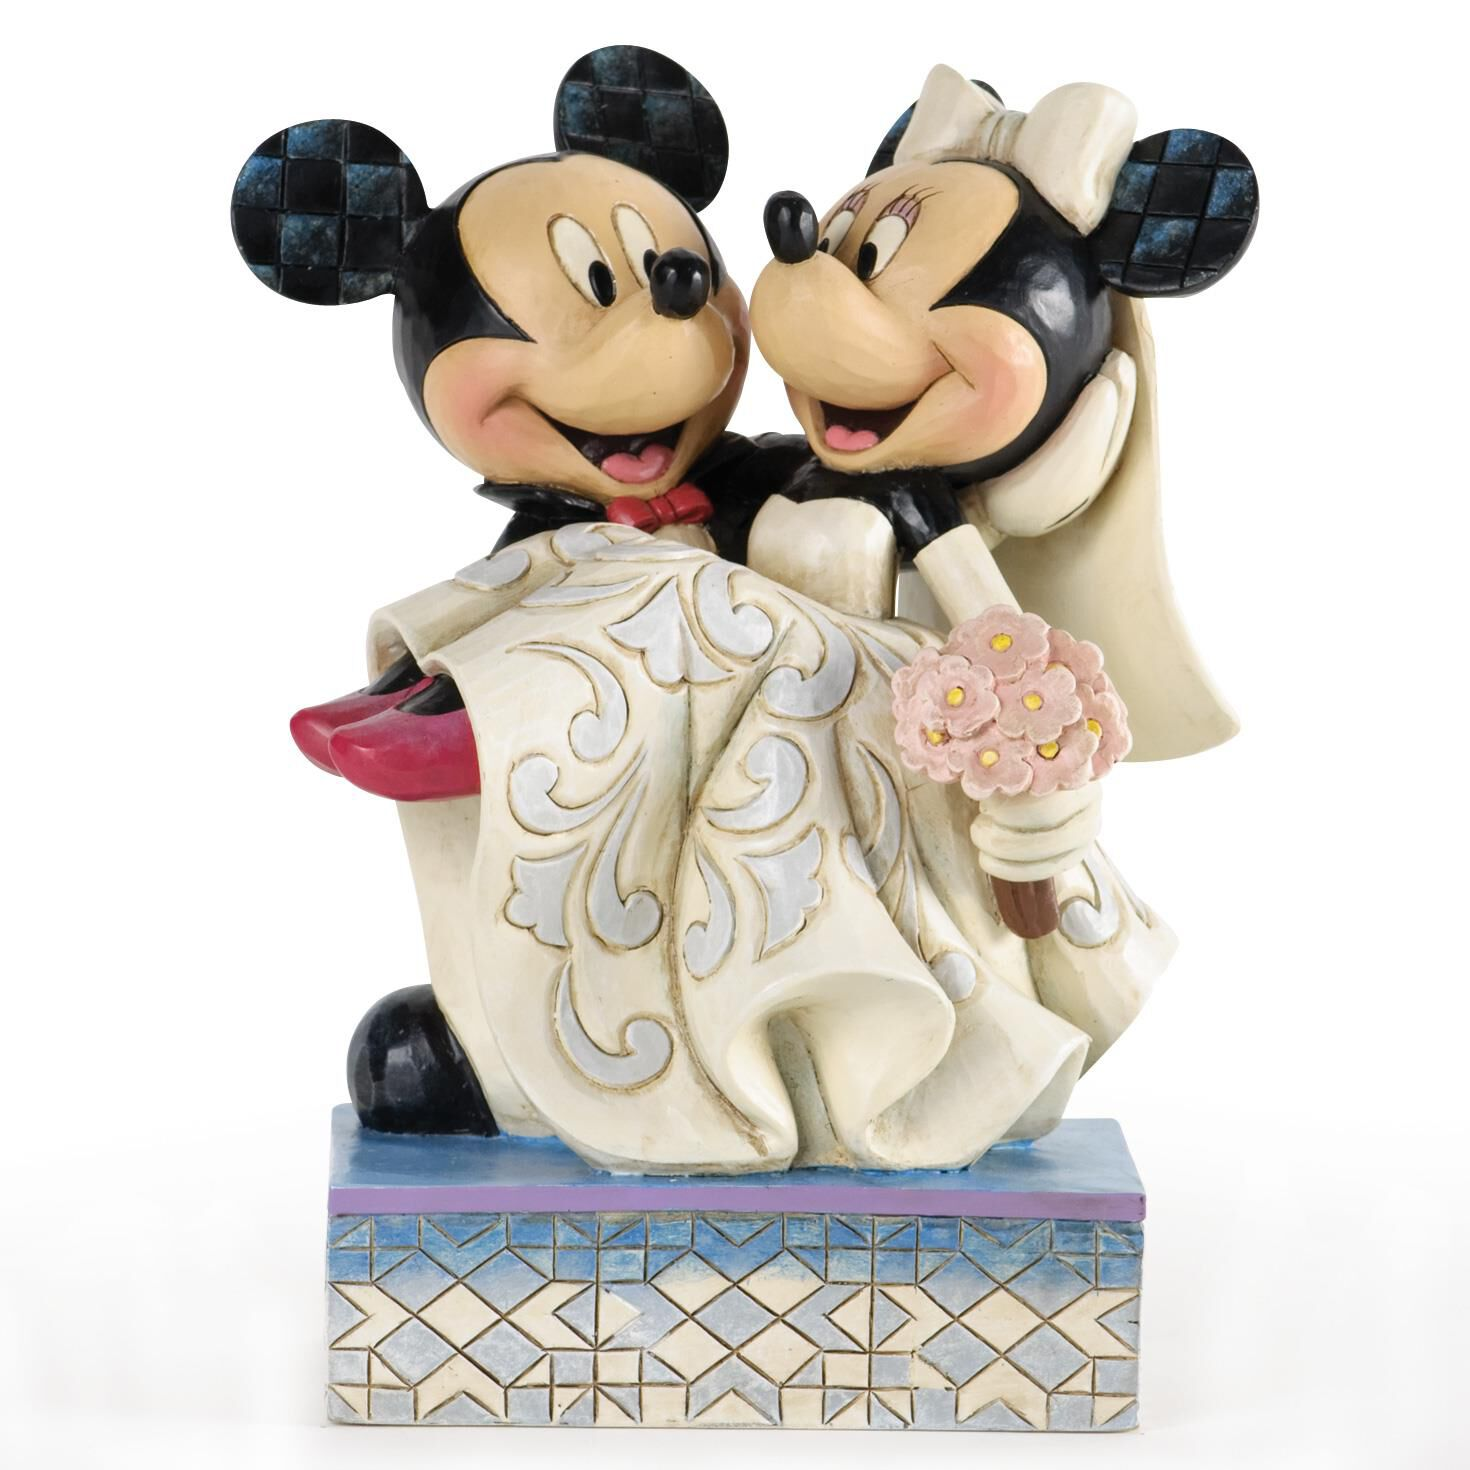 Congratulations, Mickey & Minnie Wedding Figurine - Figurines - Hallmark